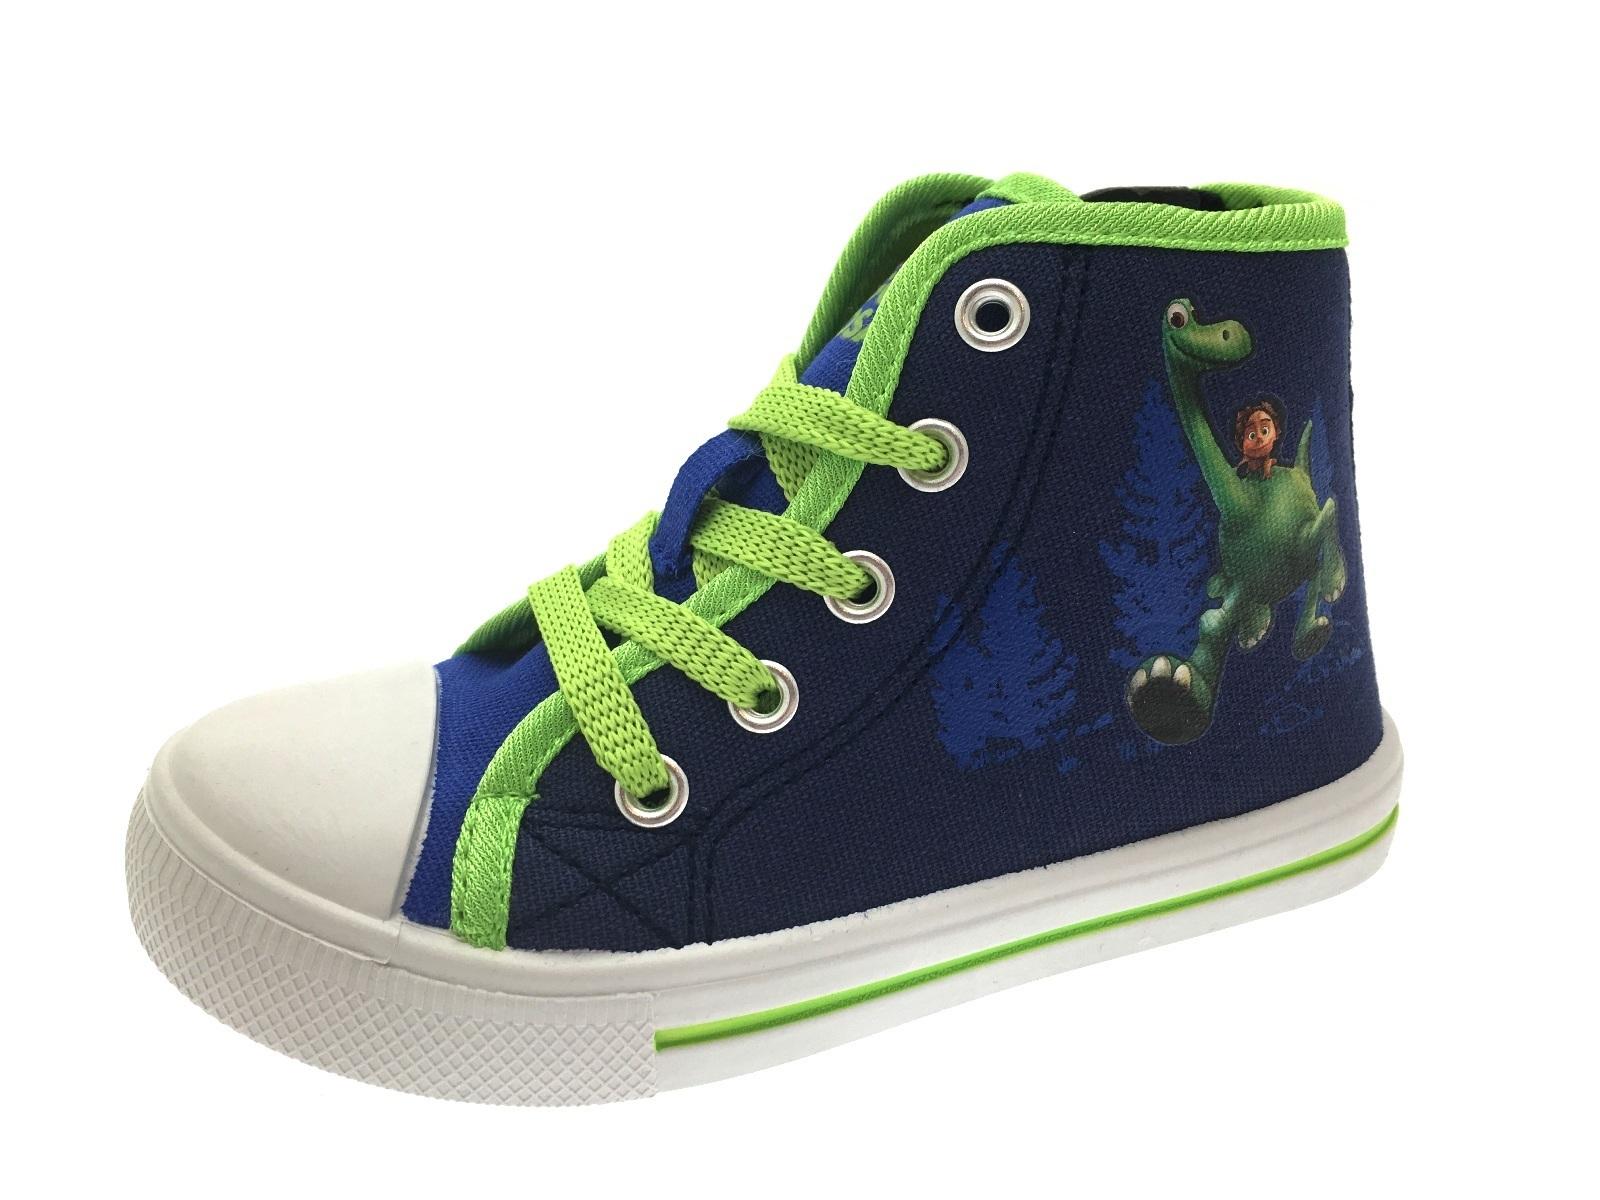 Boys The Good Dinosaur Shoes Hi Top Trainers Sports Sandals Canvas Pumps Size